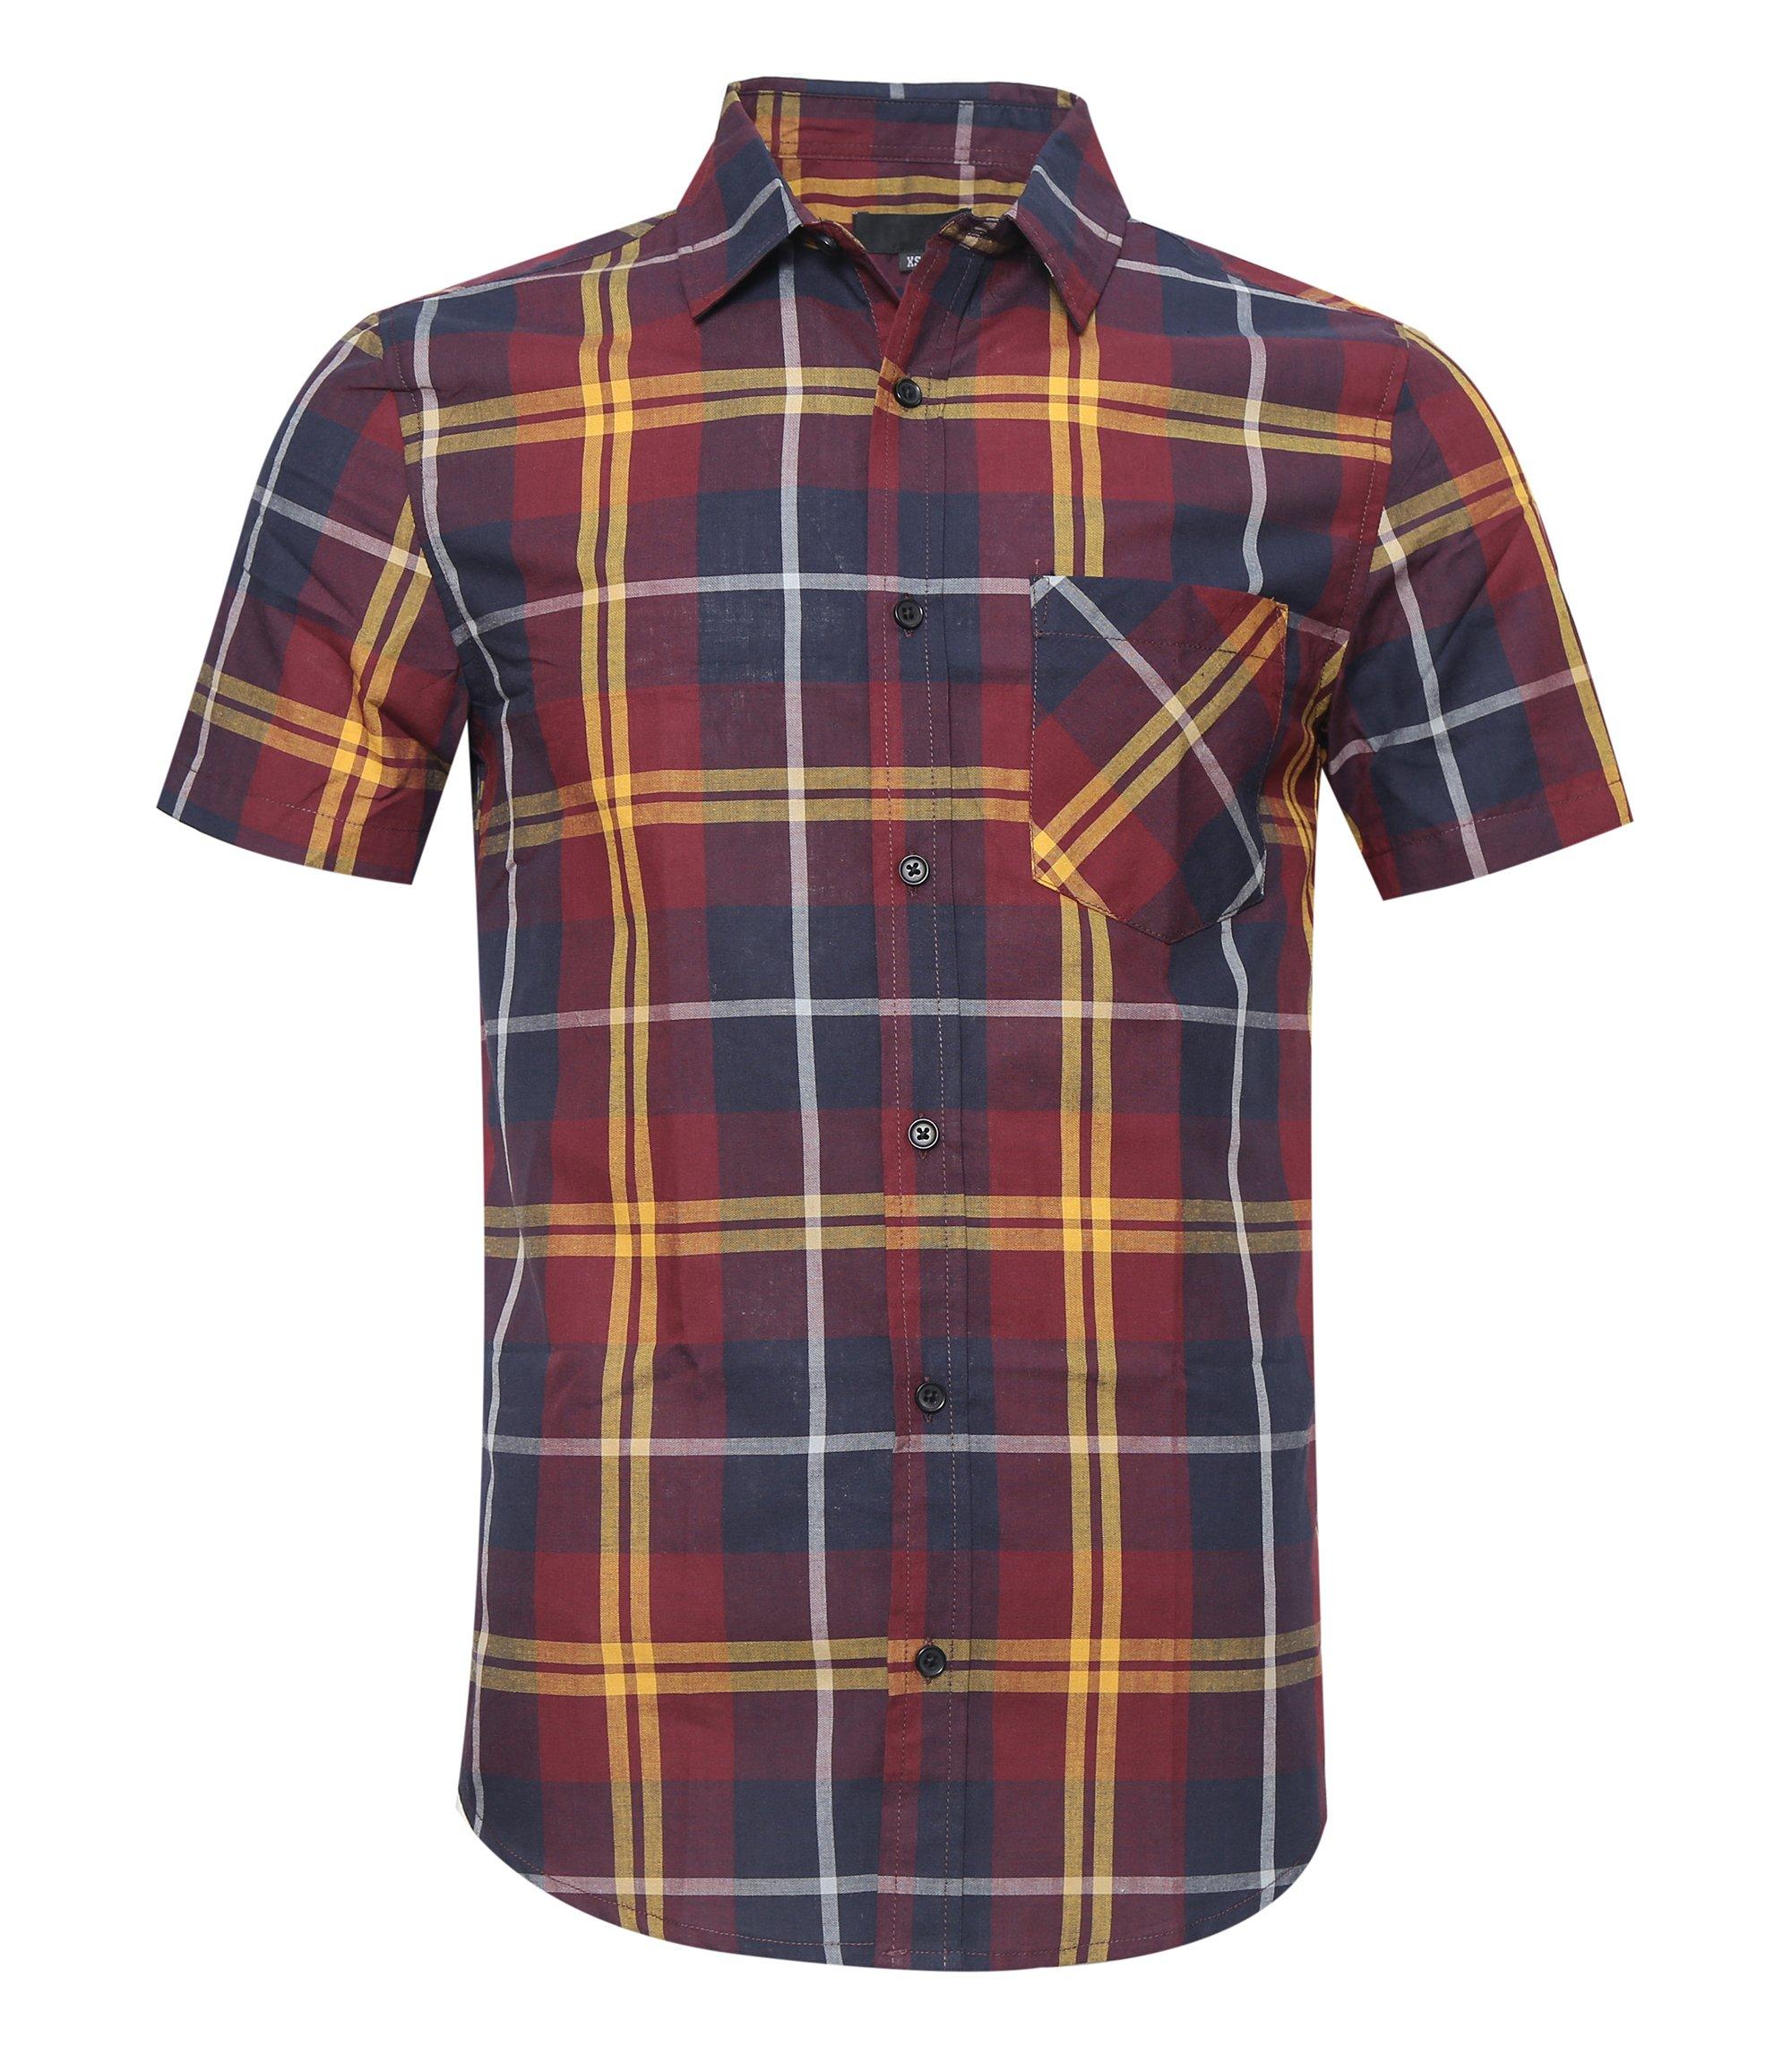 AVANZADA Men's Snap Button Down Plaid Short Sleeve Work Casual Western Shirt Rot&Yellow Large